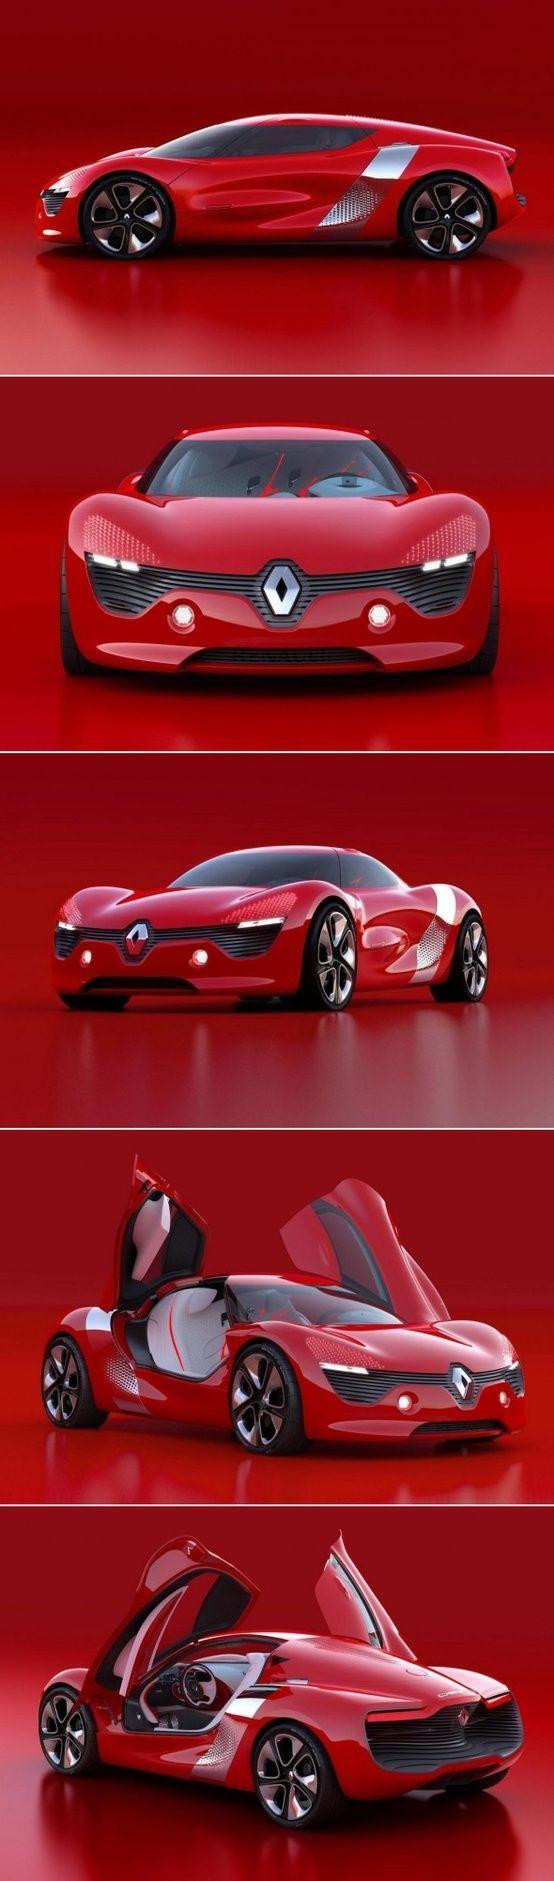 Renault DeZir ~ an electric powered concept car #ConceptCars